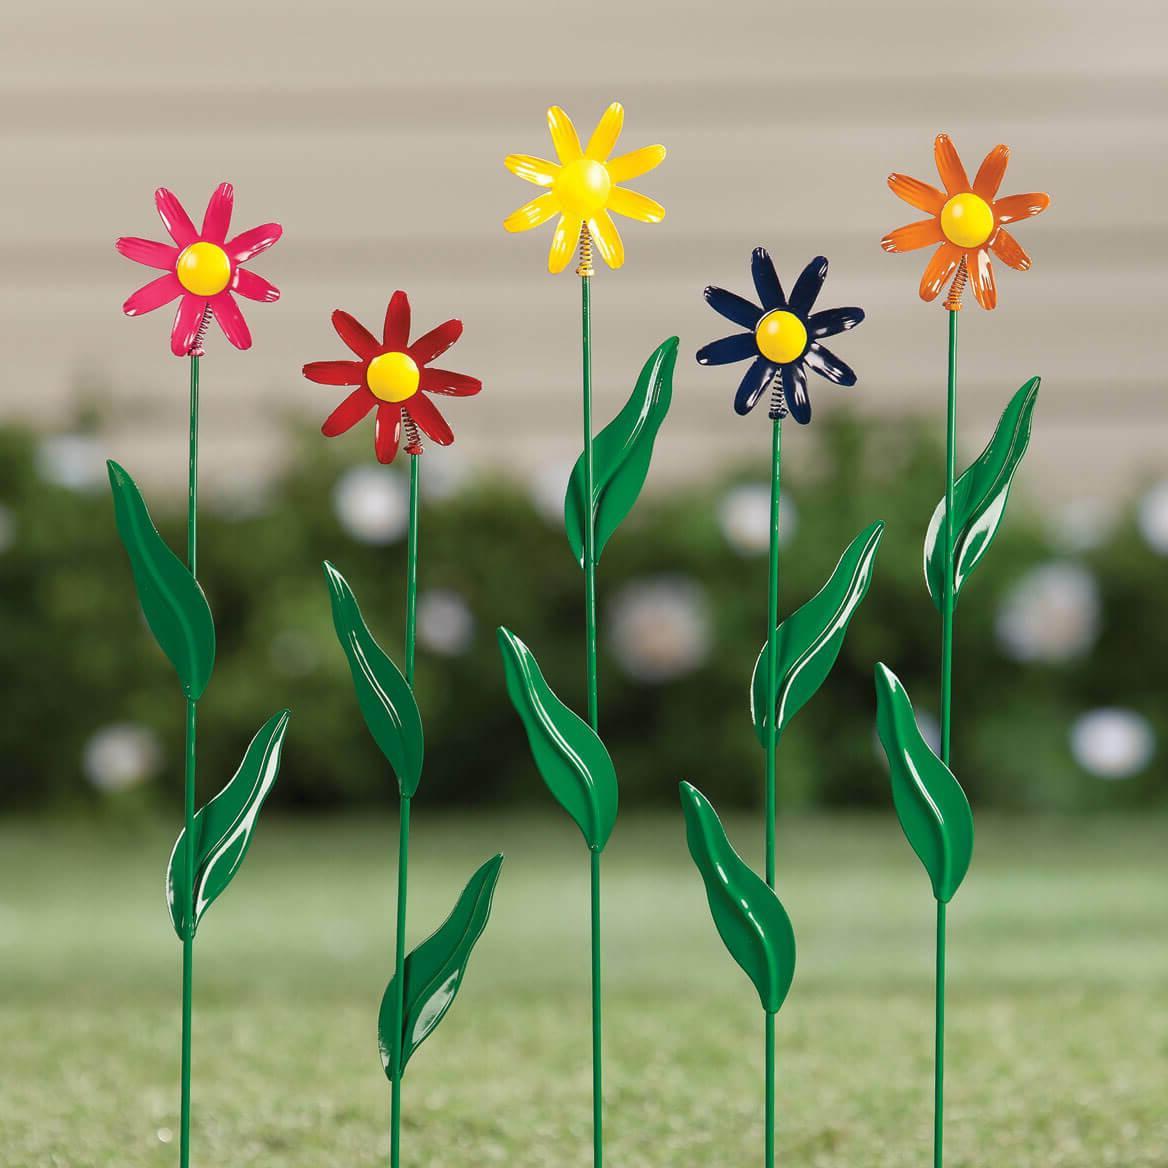 Daisy Garden Stake Set of 5 Metal Flower Yard Art Outdoor Pl